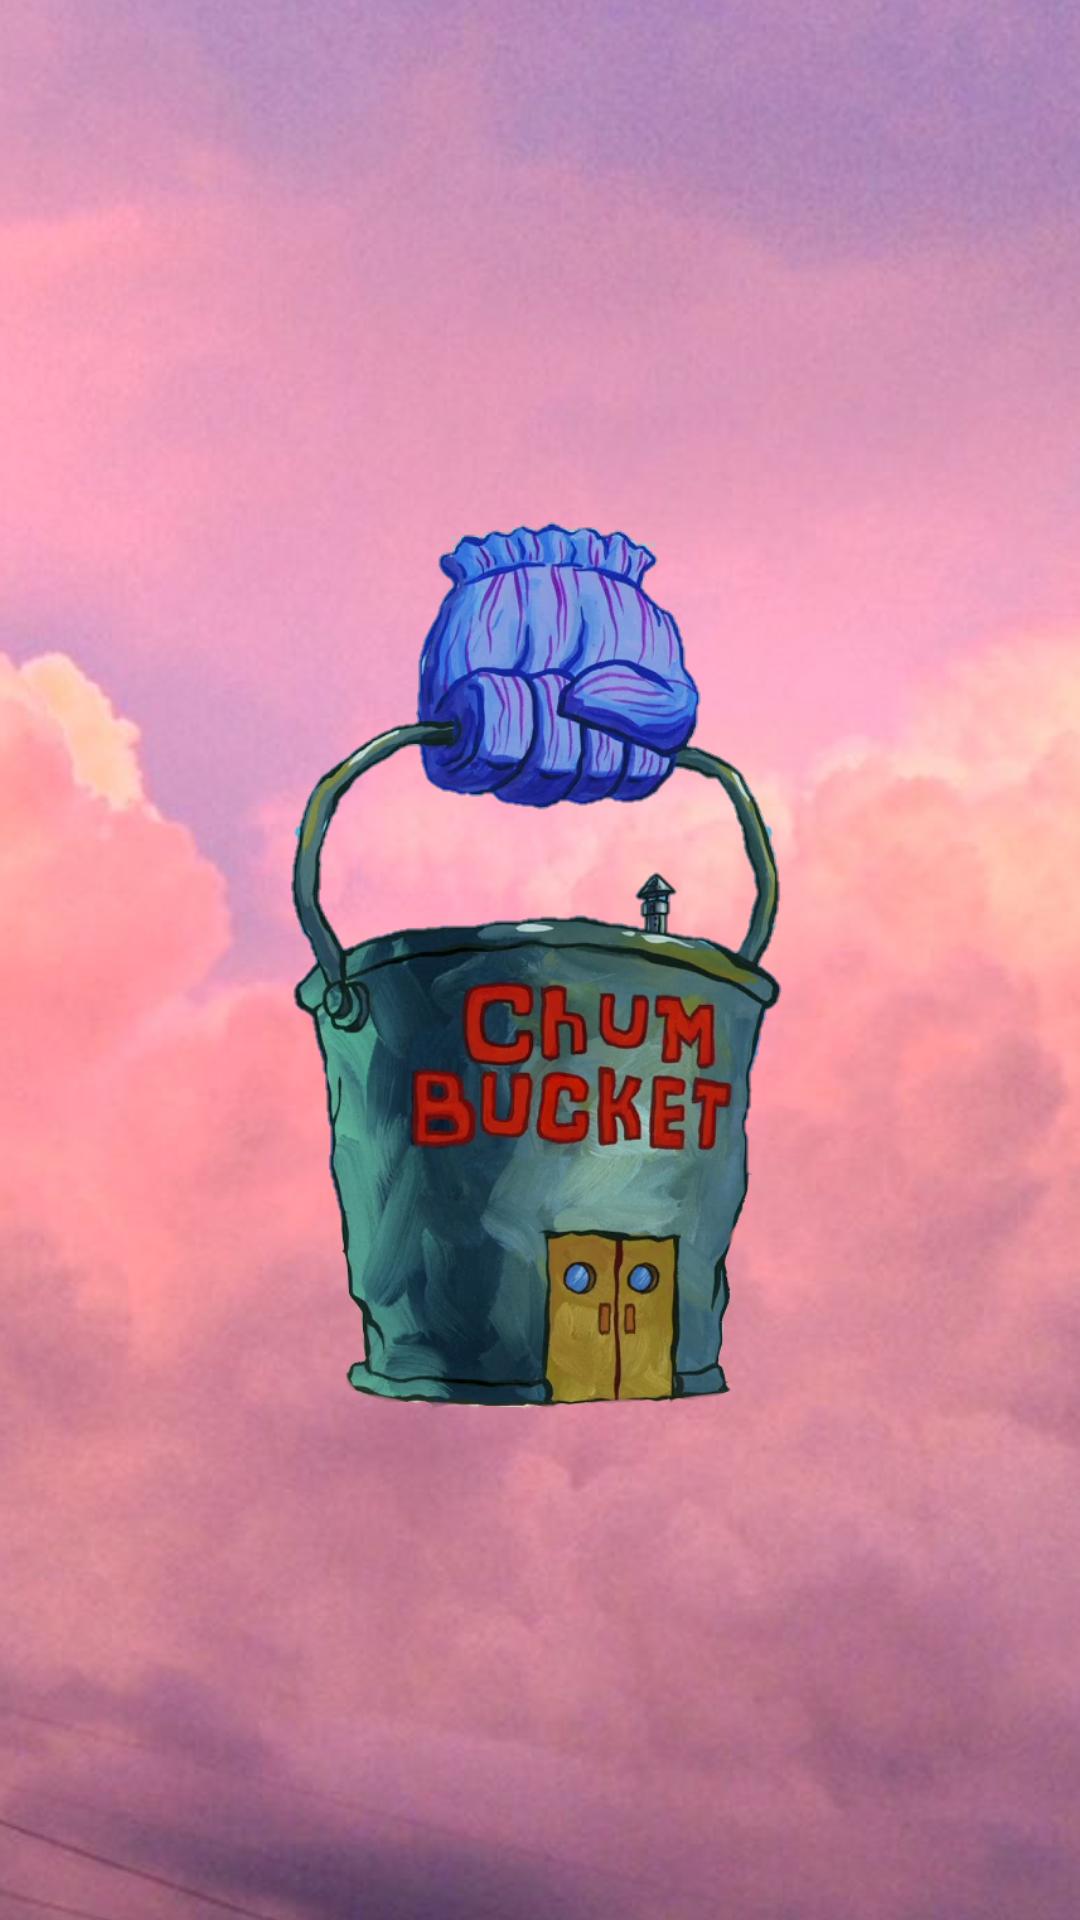 Krusty Krab & Chum Bucket Spongebob Aesthetic Wallpaper - Spongebob Aesthetic , HD Wallpaper & Backgrounds